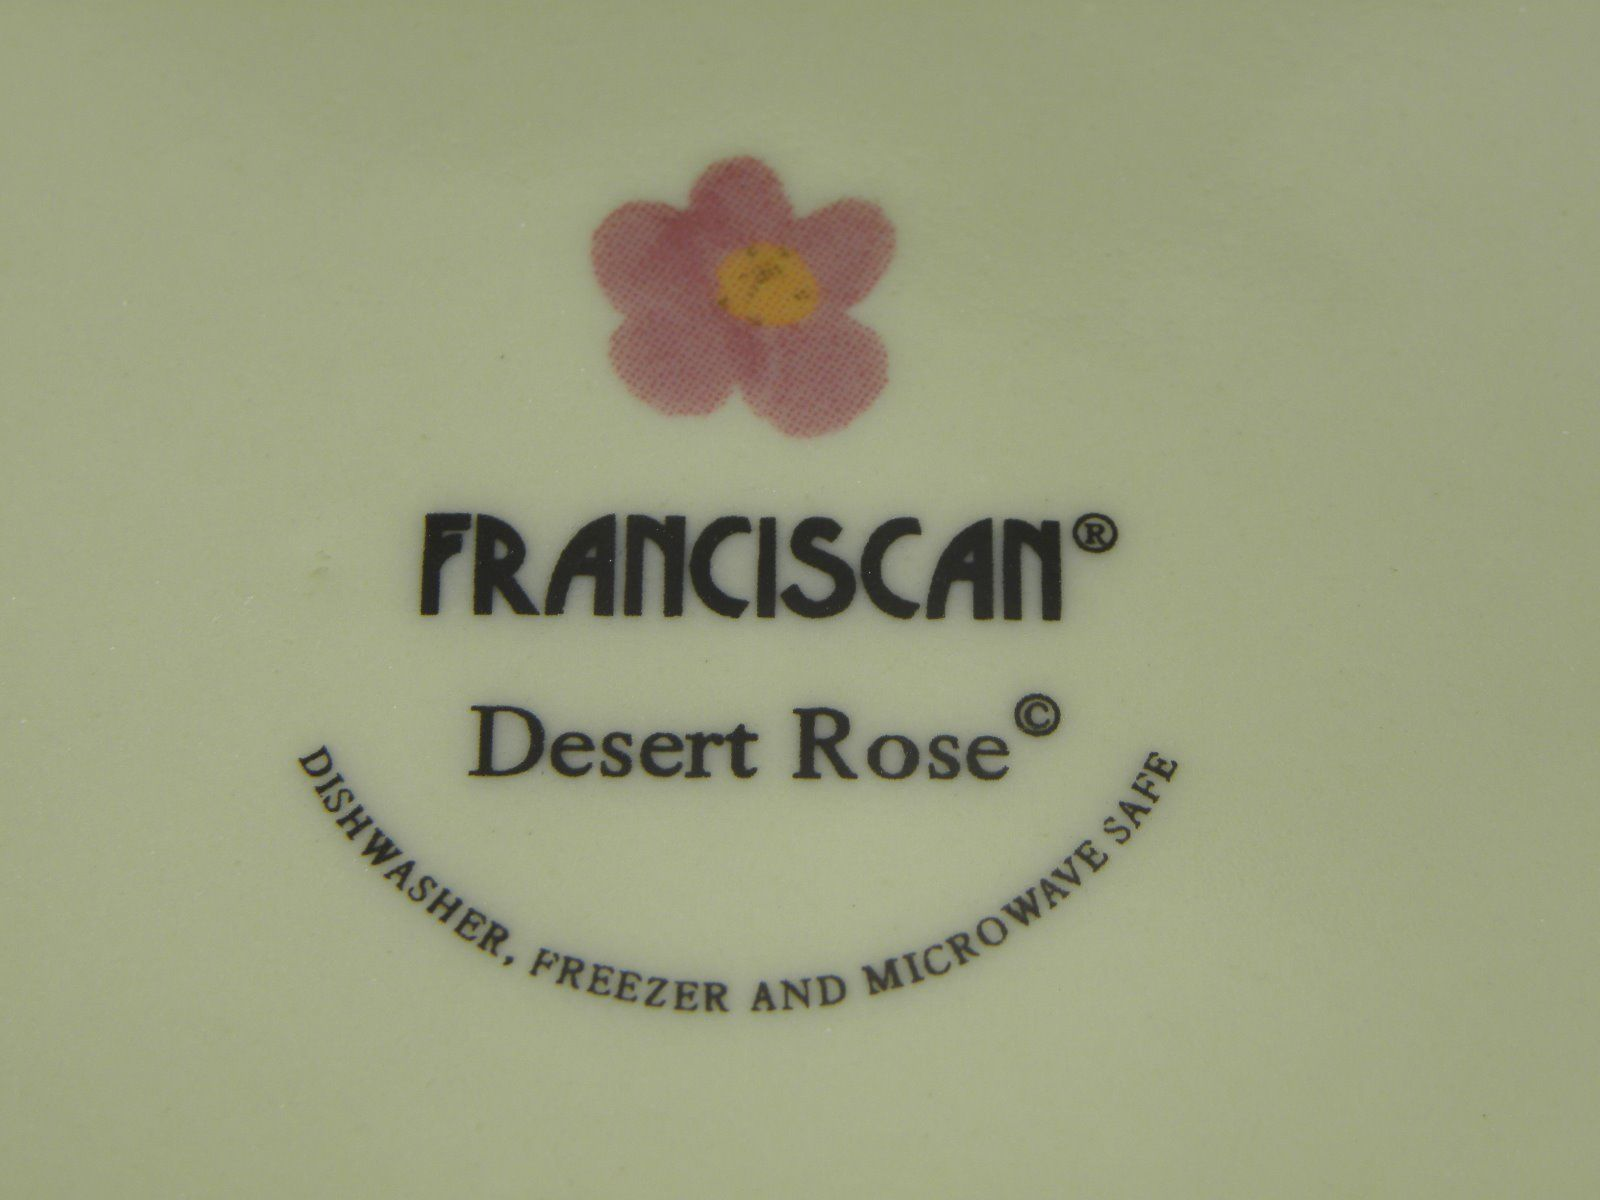 Franciscan Desert Rose Salad Bowl BRAND NEW PRODUCTION